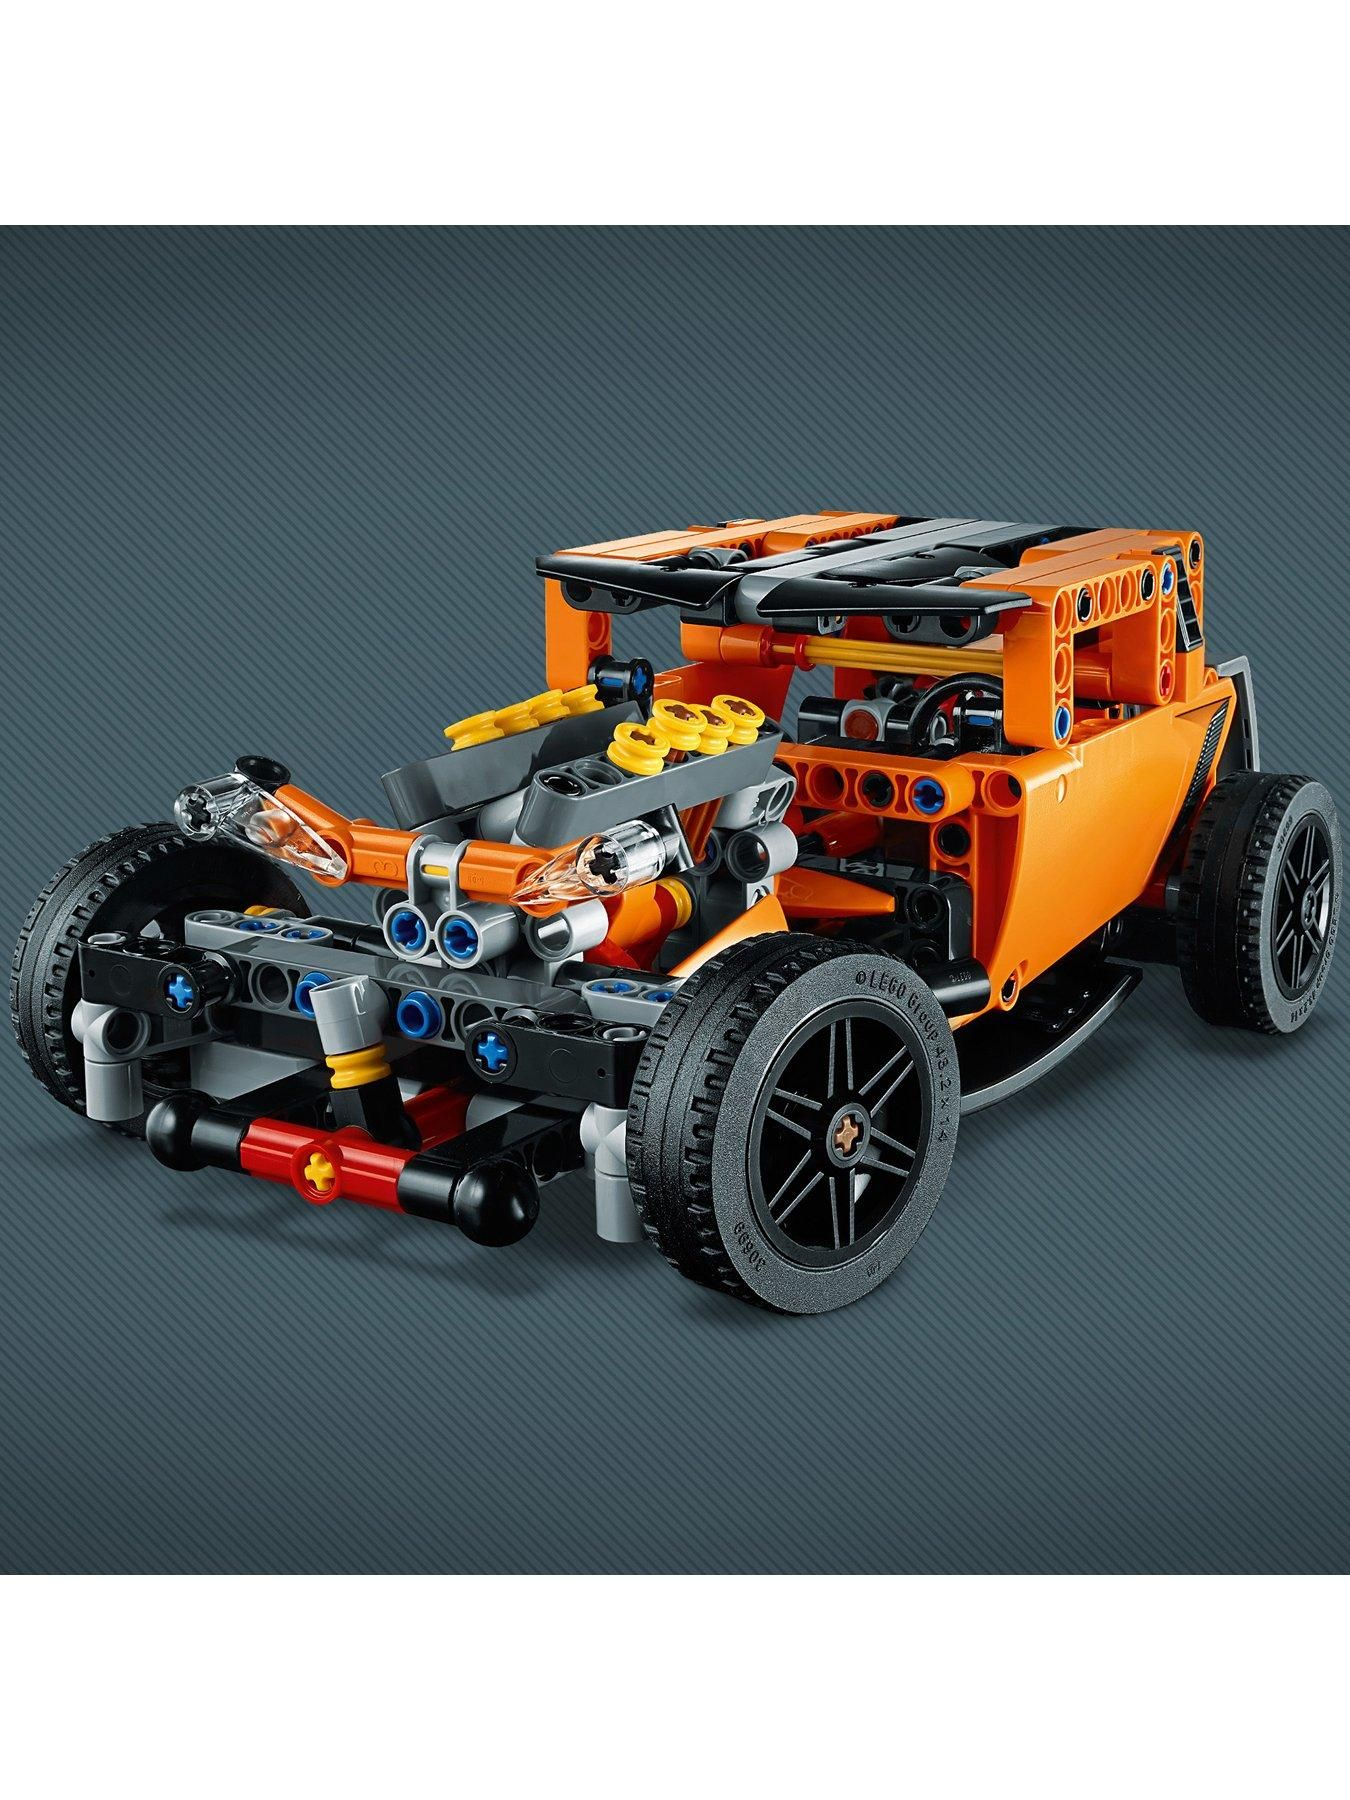 Lego Technic 42093 Chevrolet Corvette Zr1 Corvette Zr1